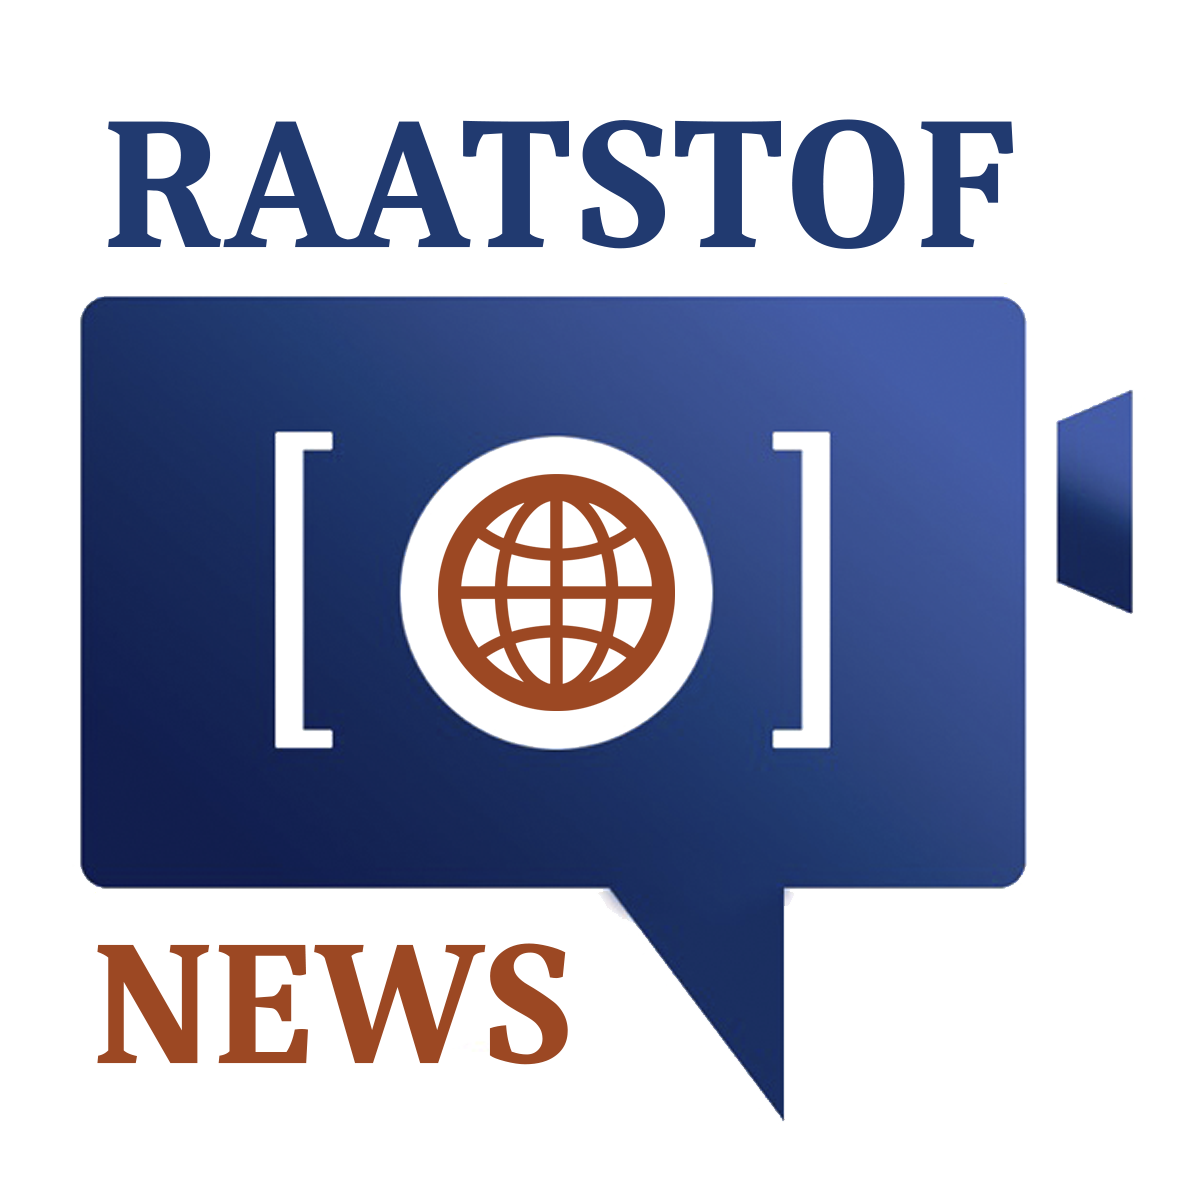 Raatstof News 4. marts 2021